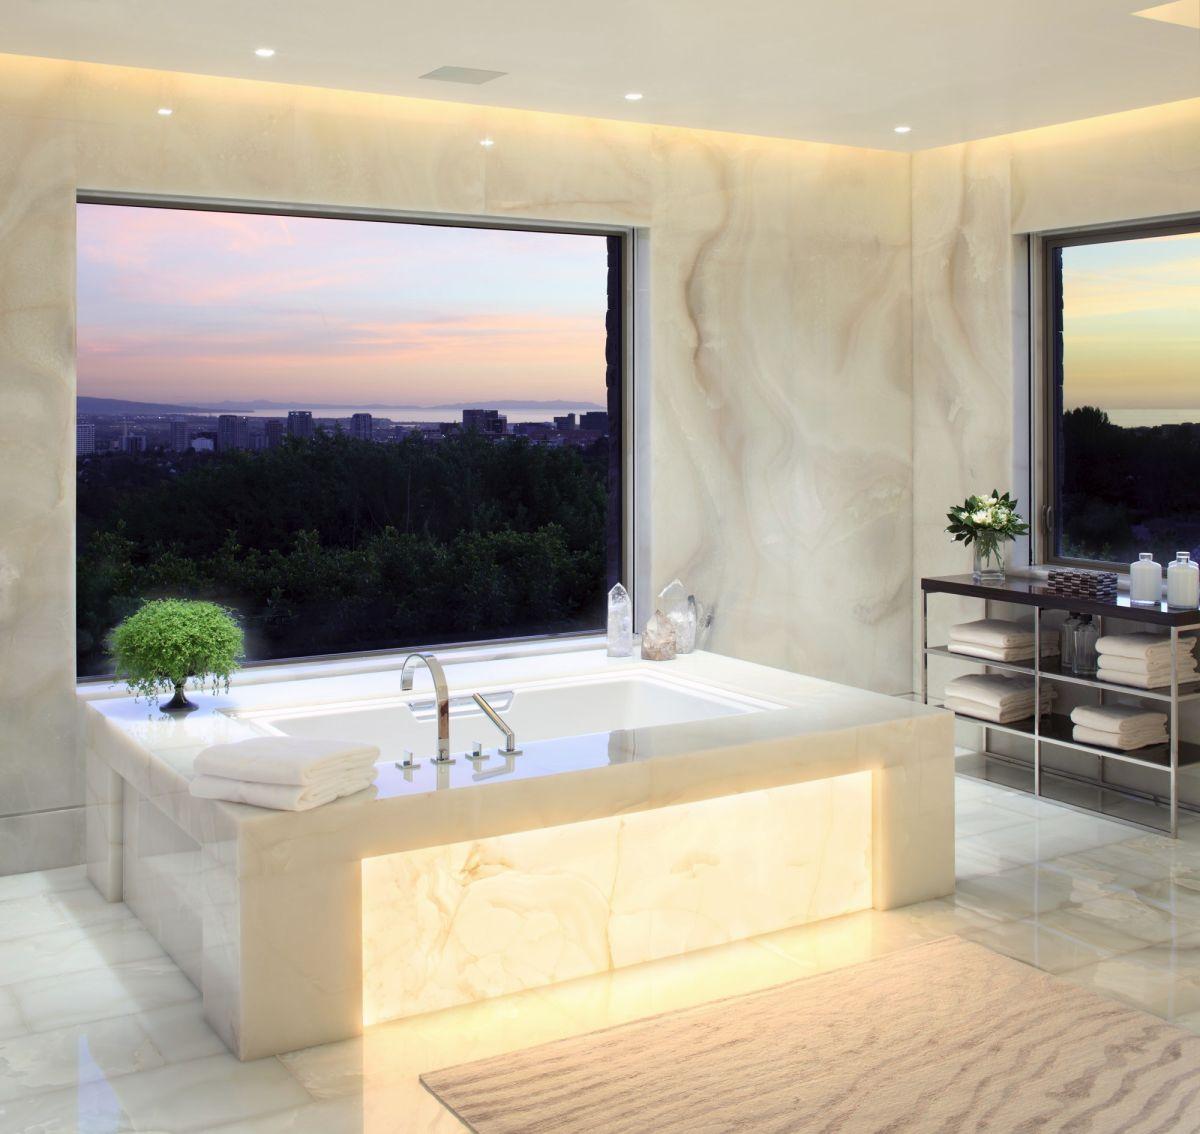 Home Design Inspiration: Hillside Luxury Home Design Inspiration